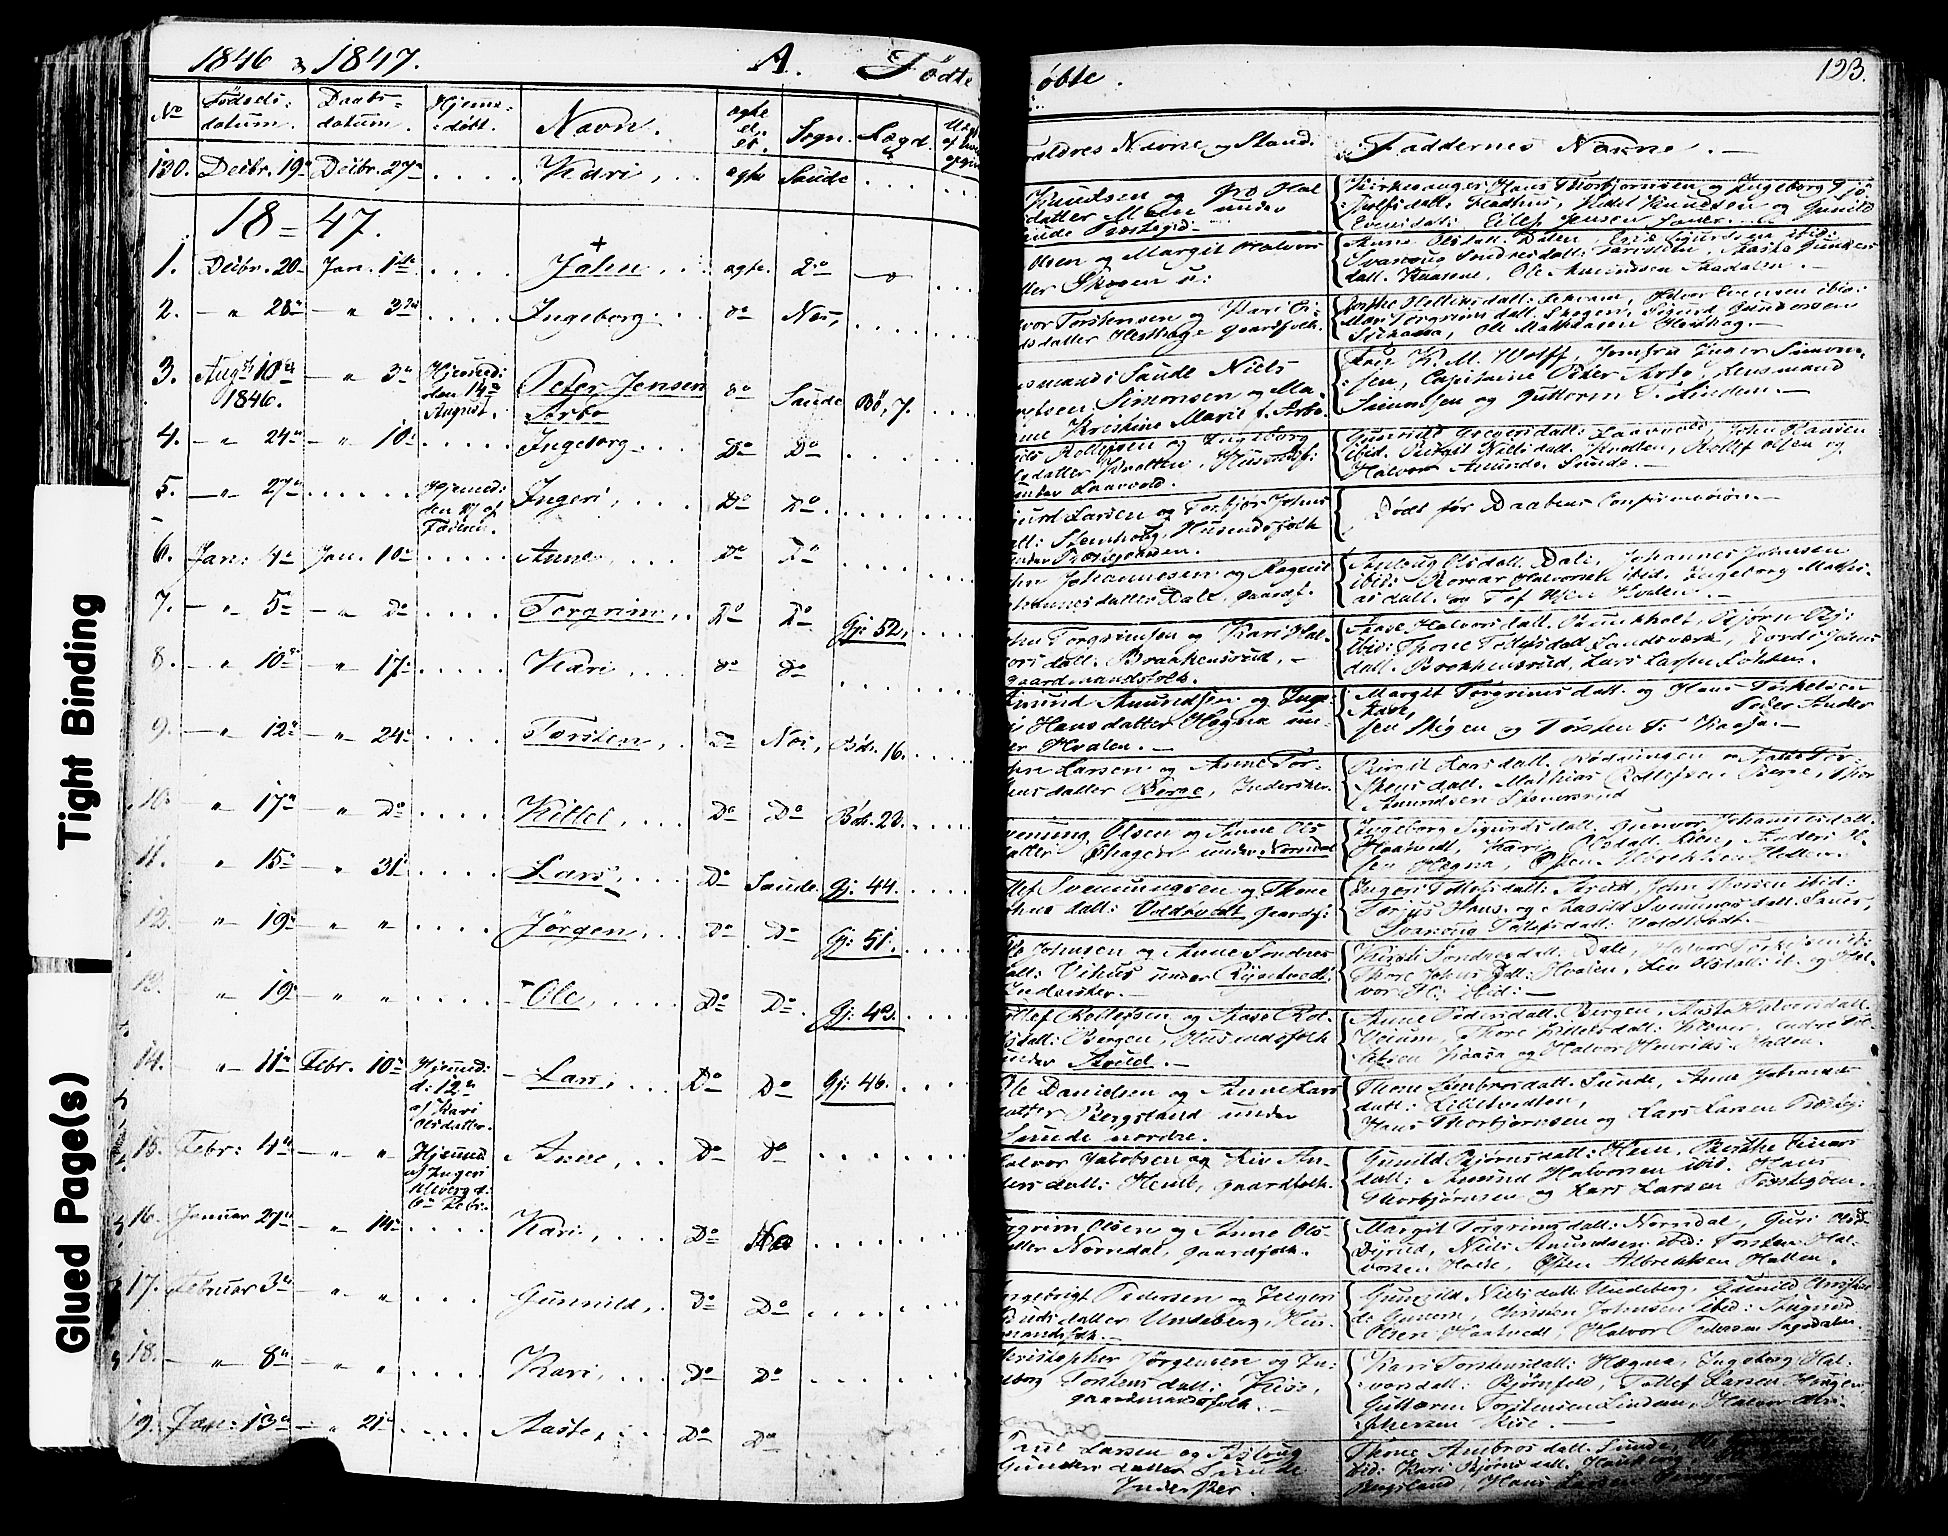 SAKO, Sauherad kirkebøker, F/Fa/L0006: Ministerialbok nr. I 6, 1827-1850, s. 123